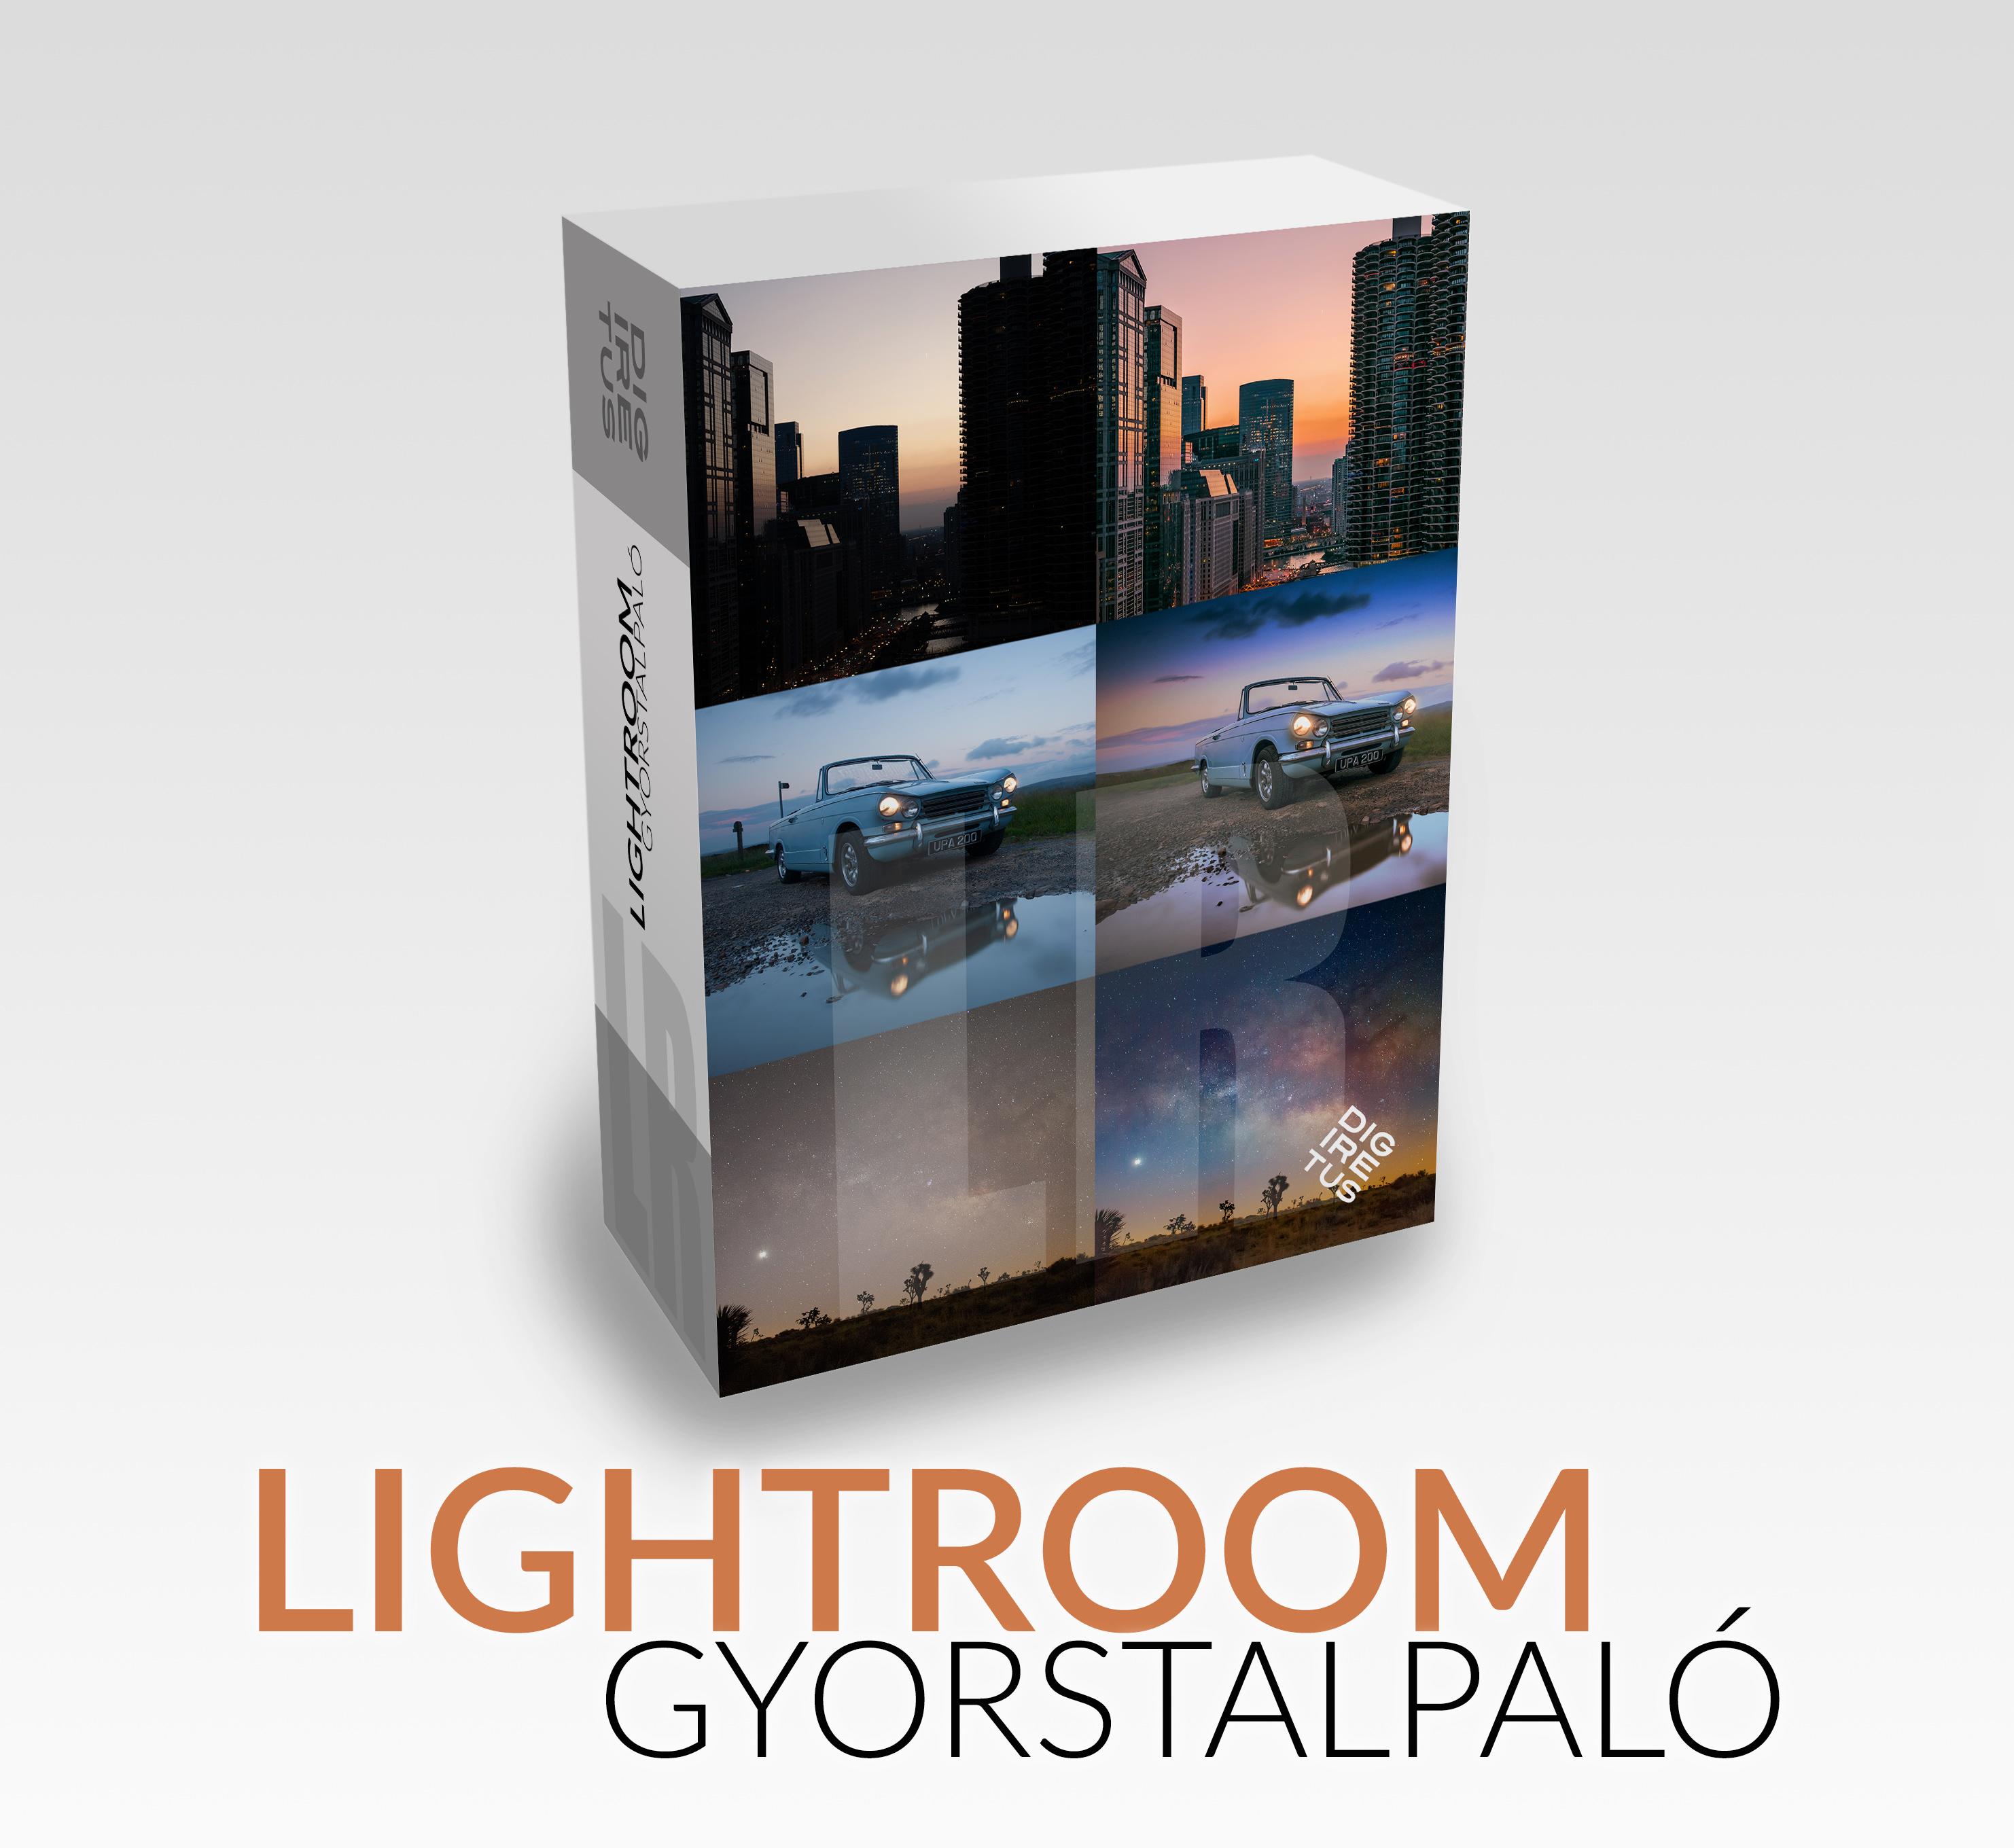 Lightroom Gyorstalpaló Prémium videók